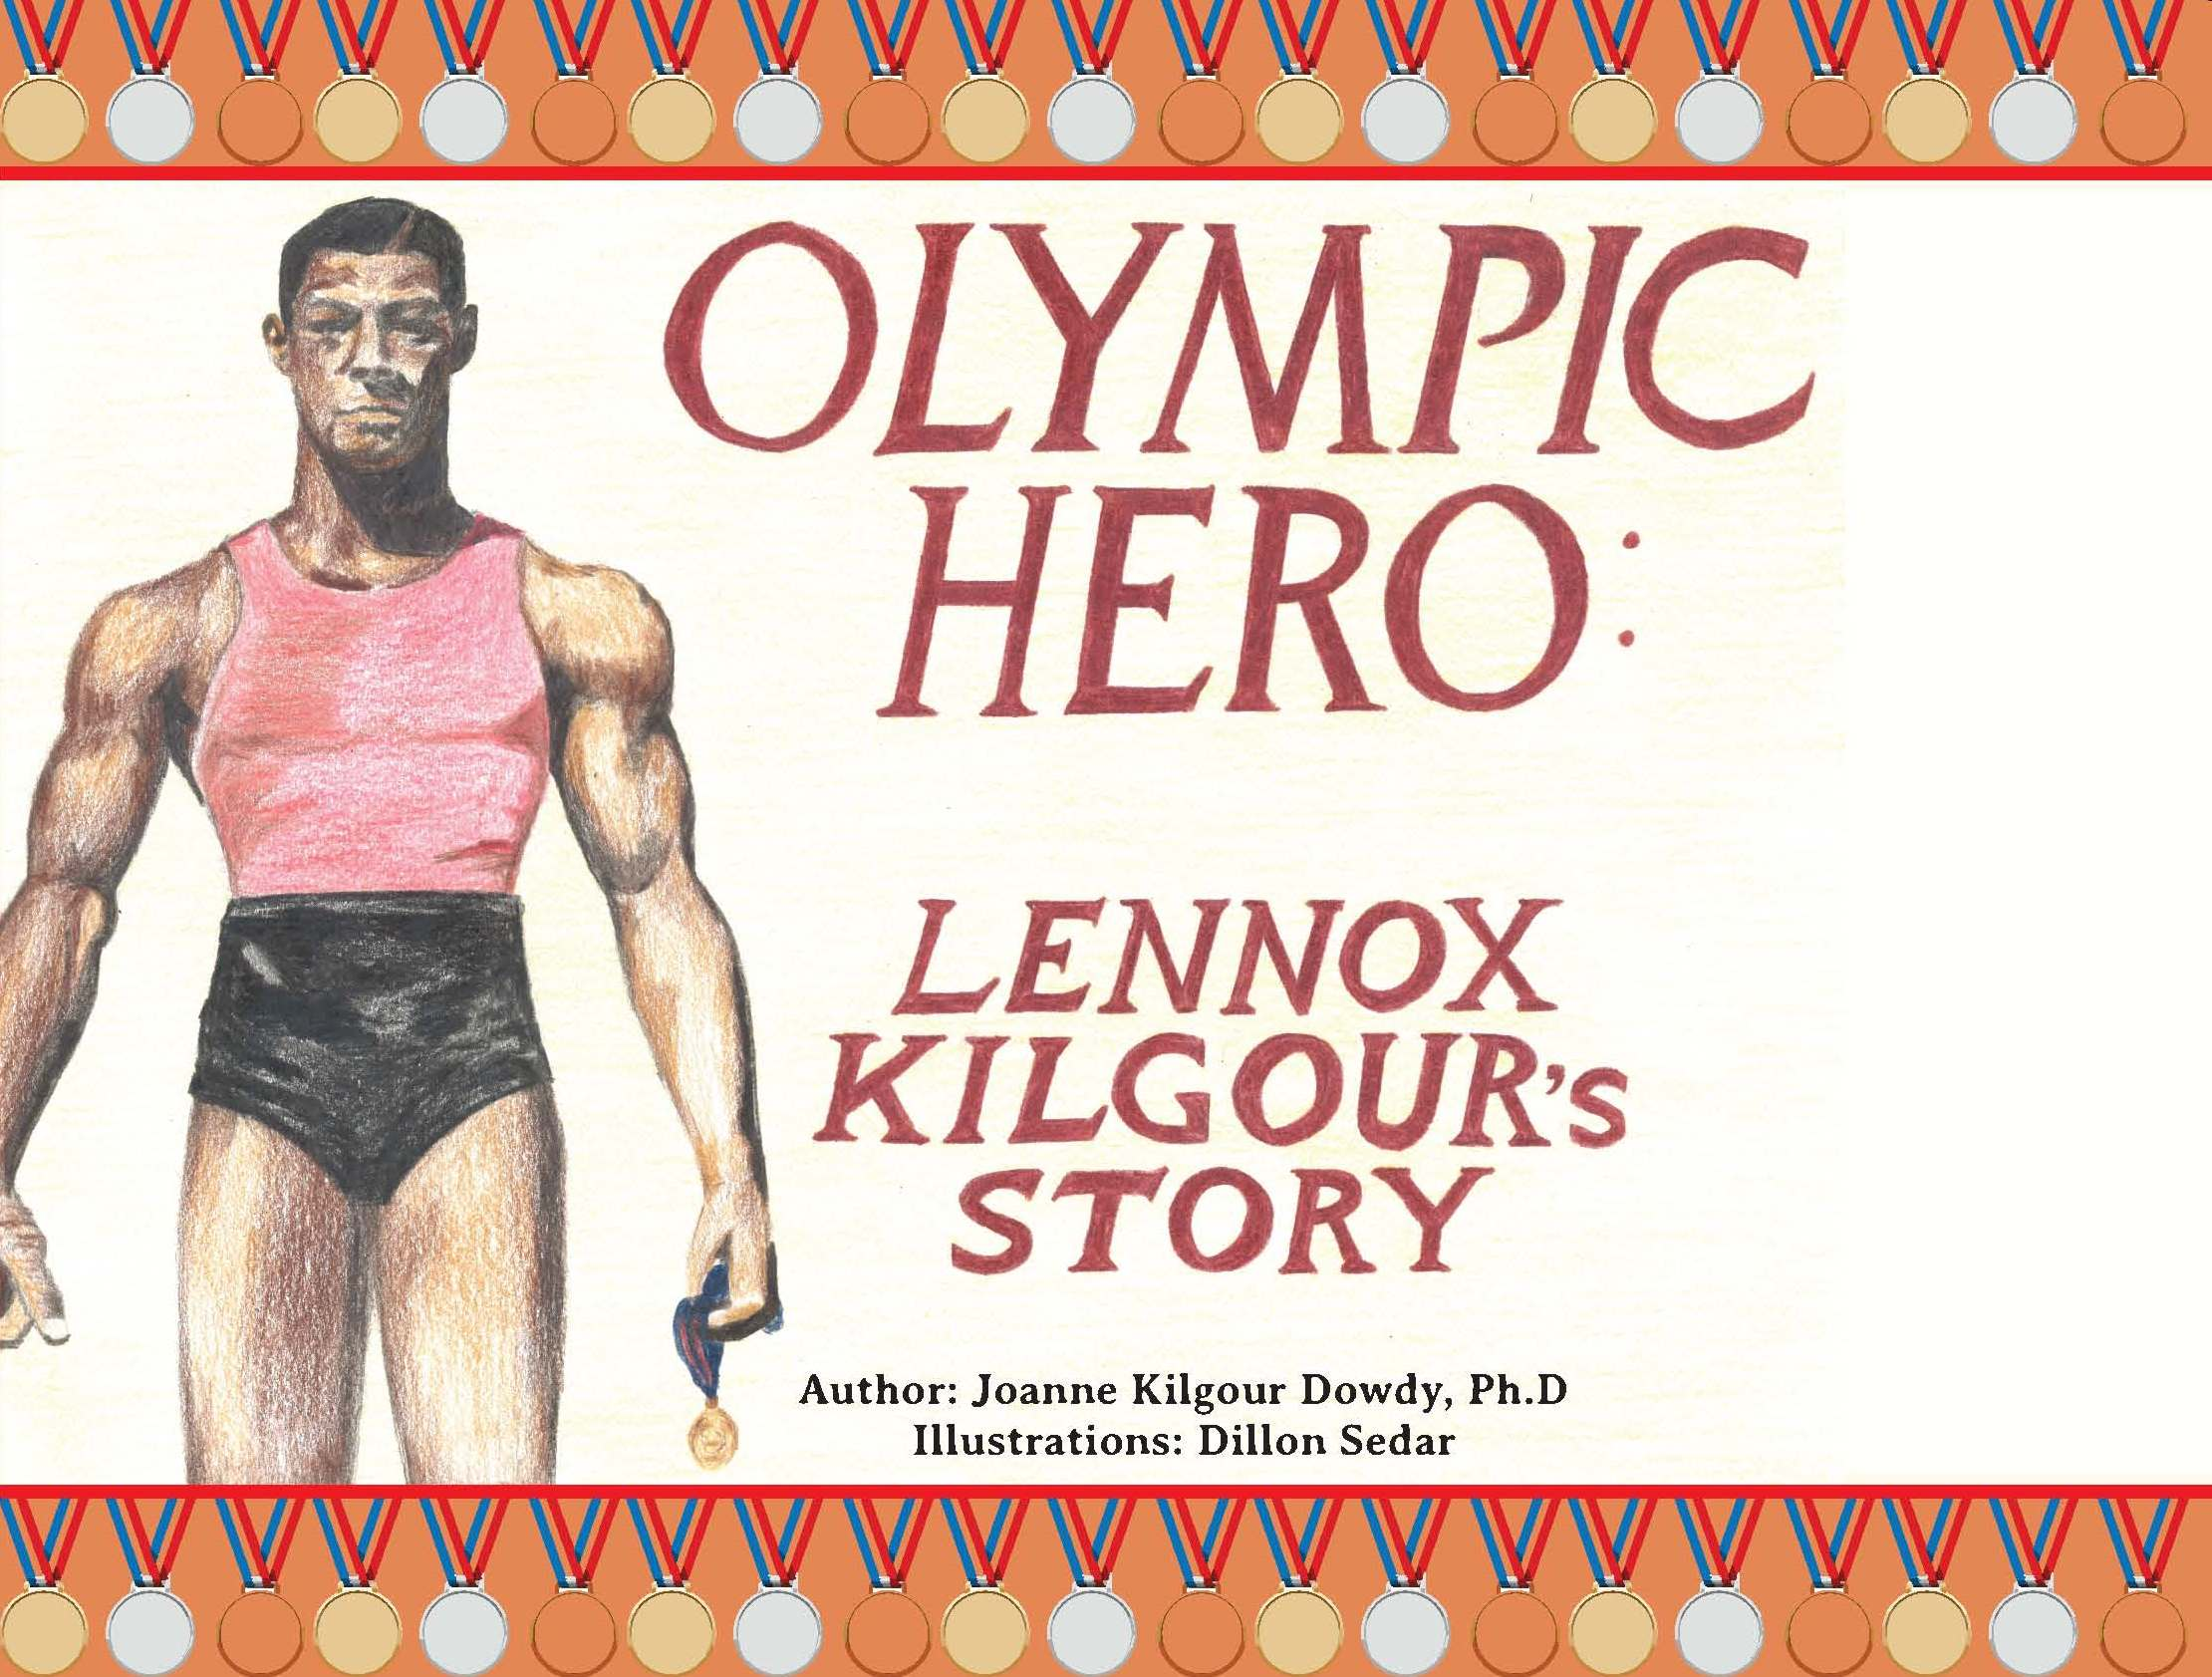 Olympic Hero: Lennox Kilgour's Story(Hard Cover)